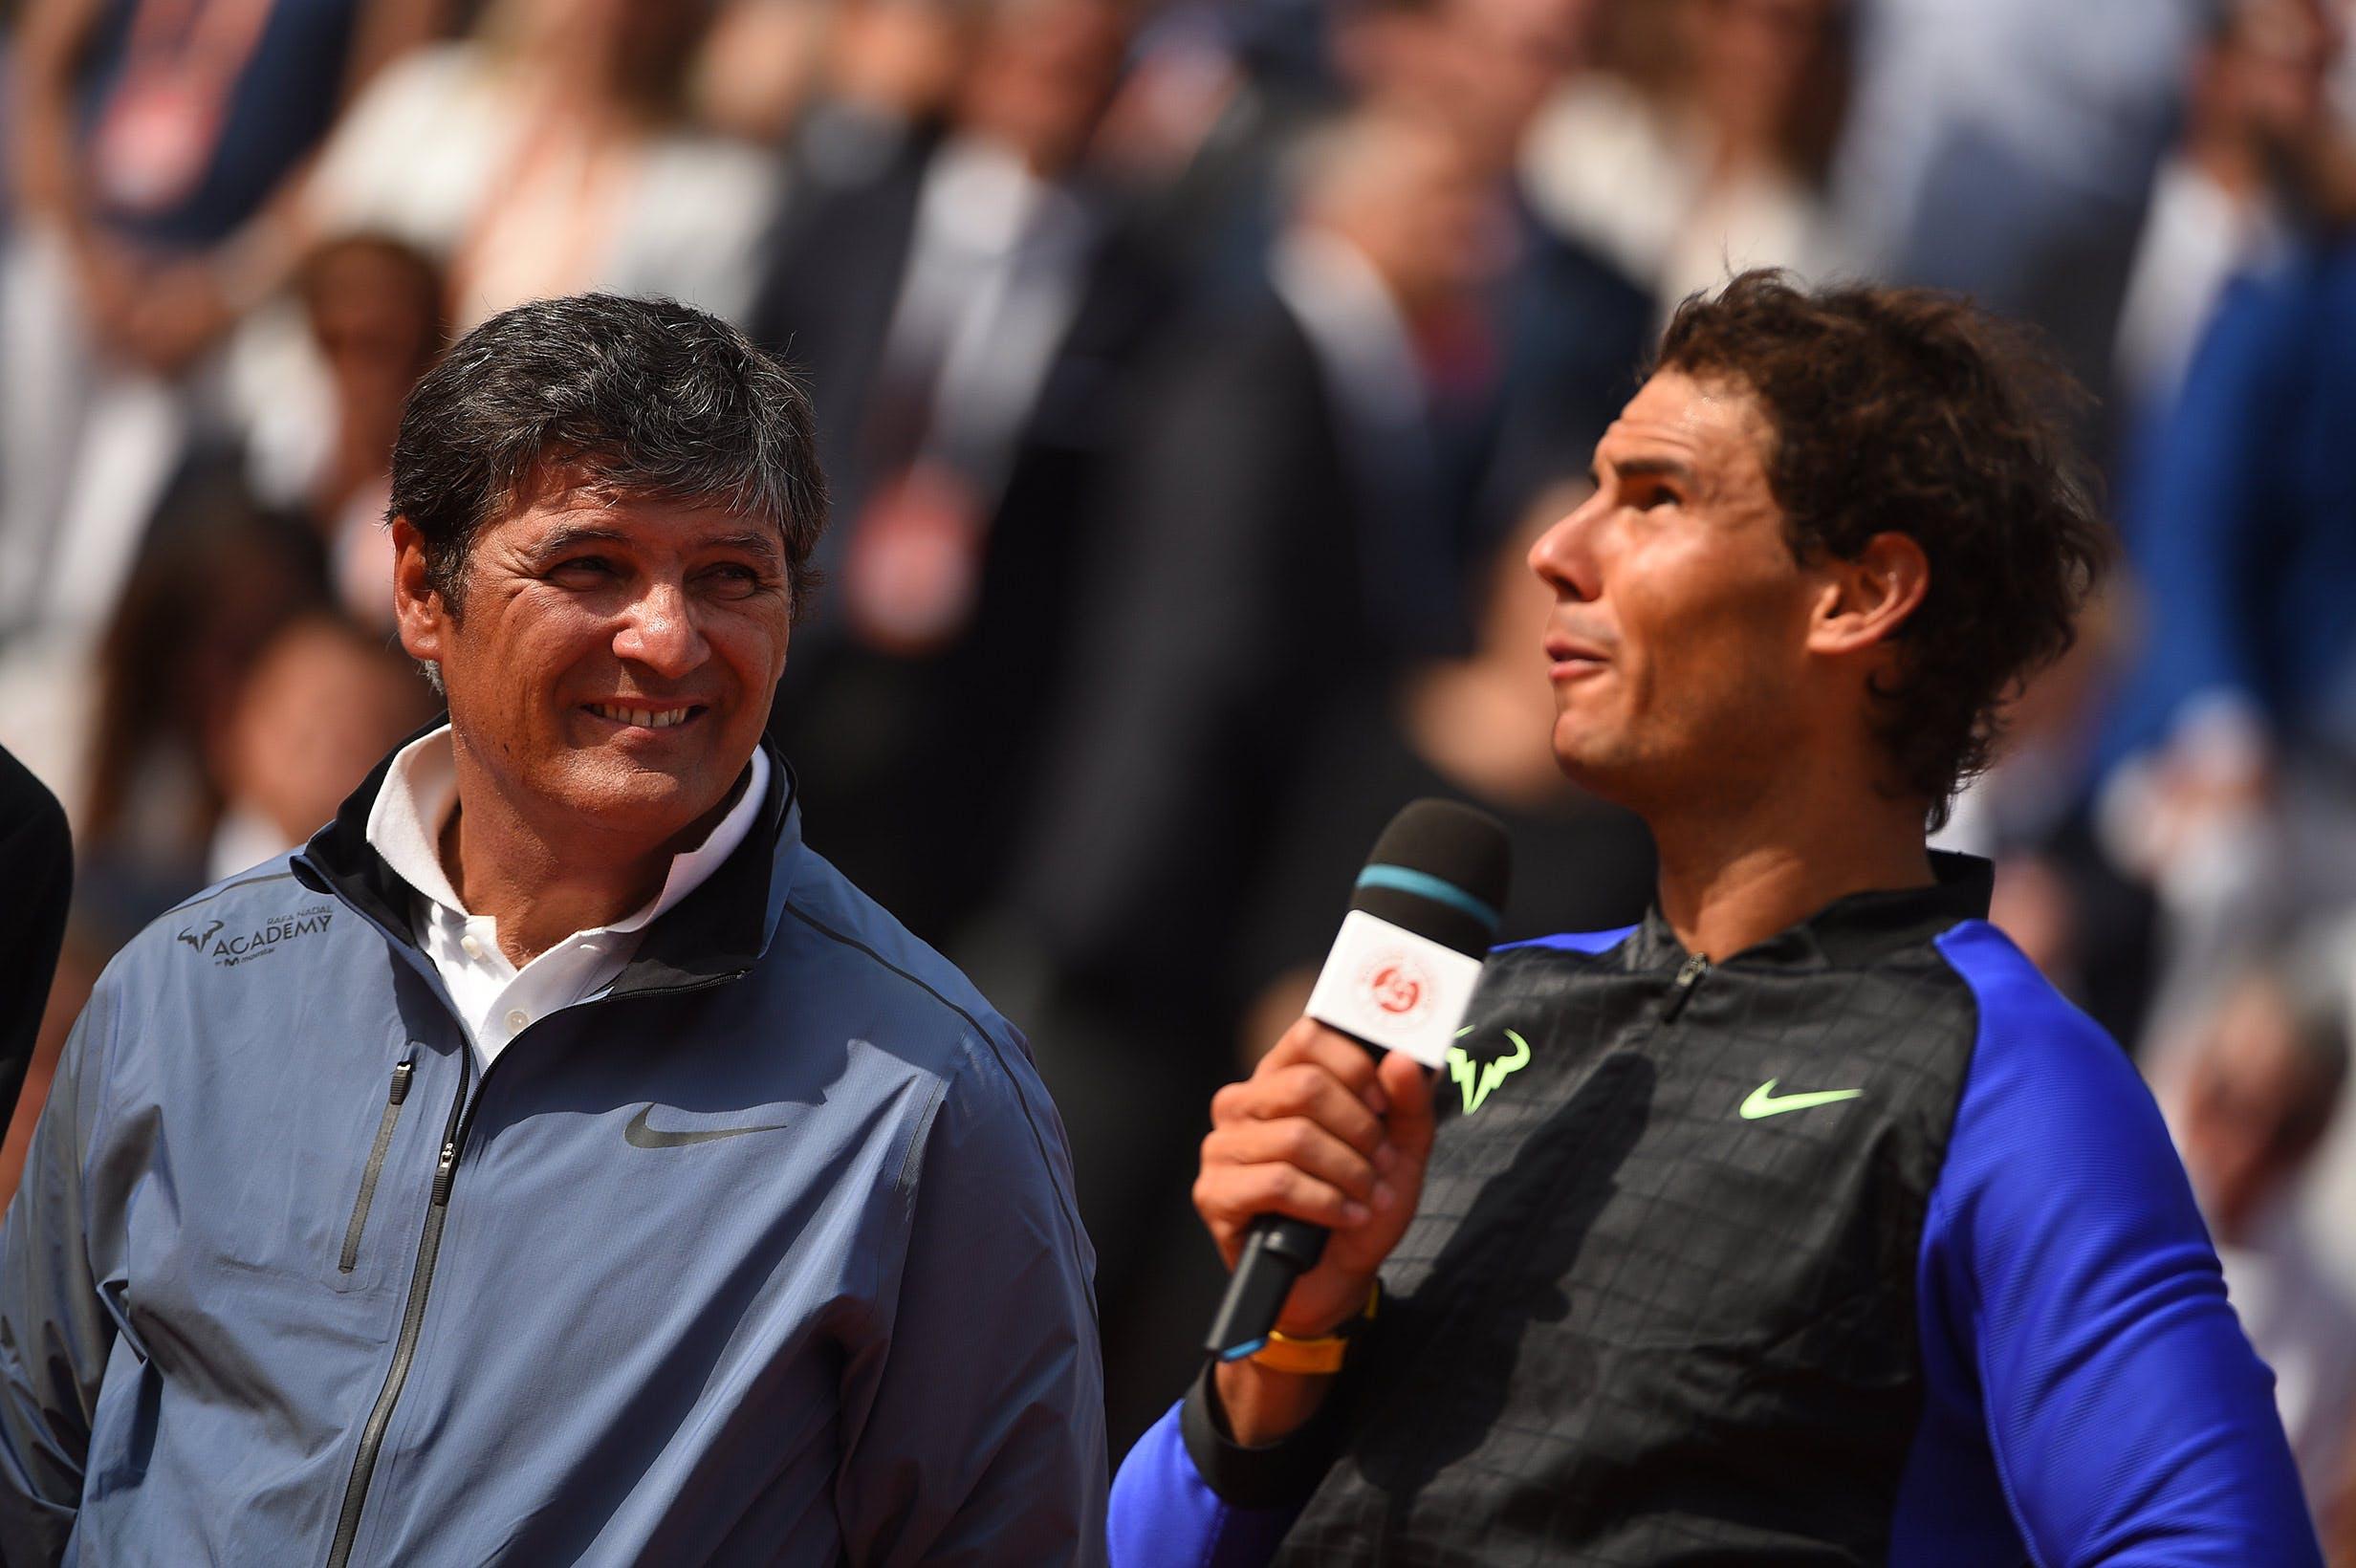 Rafael et Toni Nadal à la remise des prix de Roland-Garros 2017./ Rafael and Toni Nadal at the trophy ceremony Roland-Garros 2017